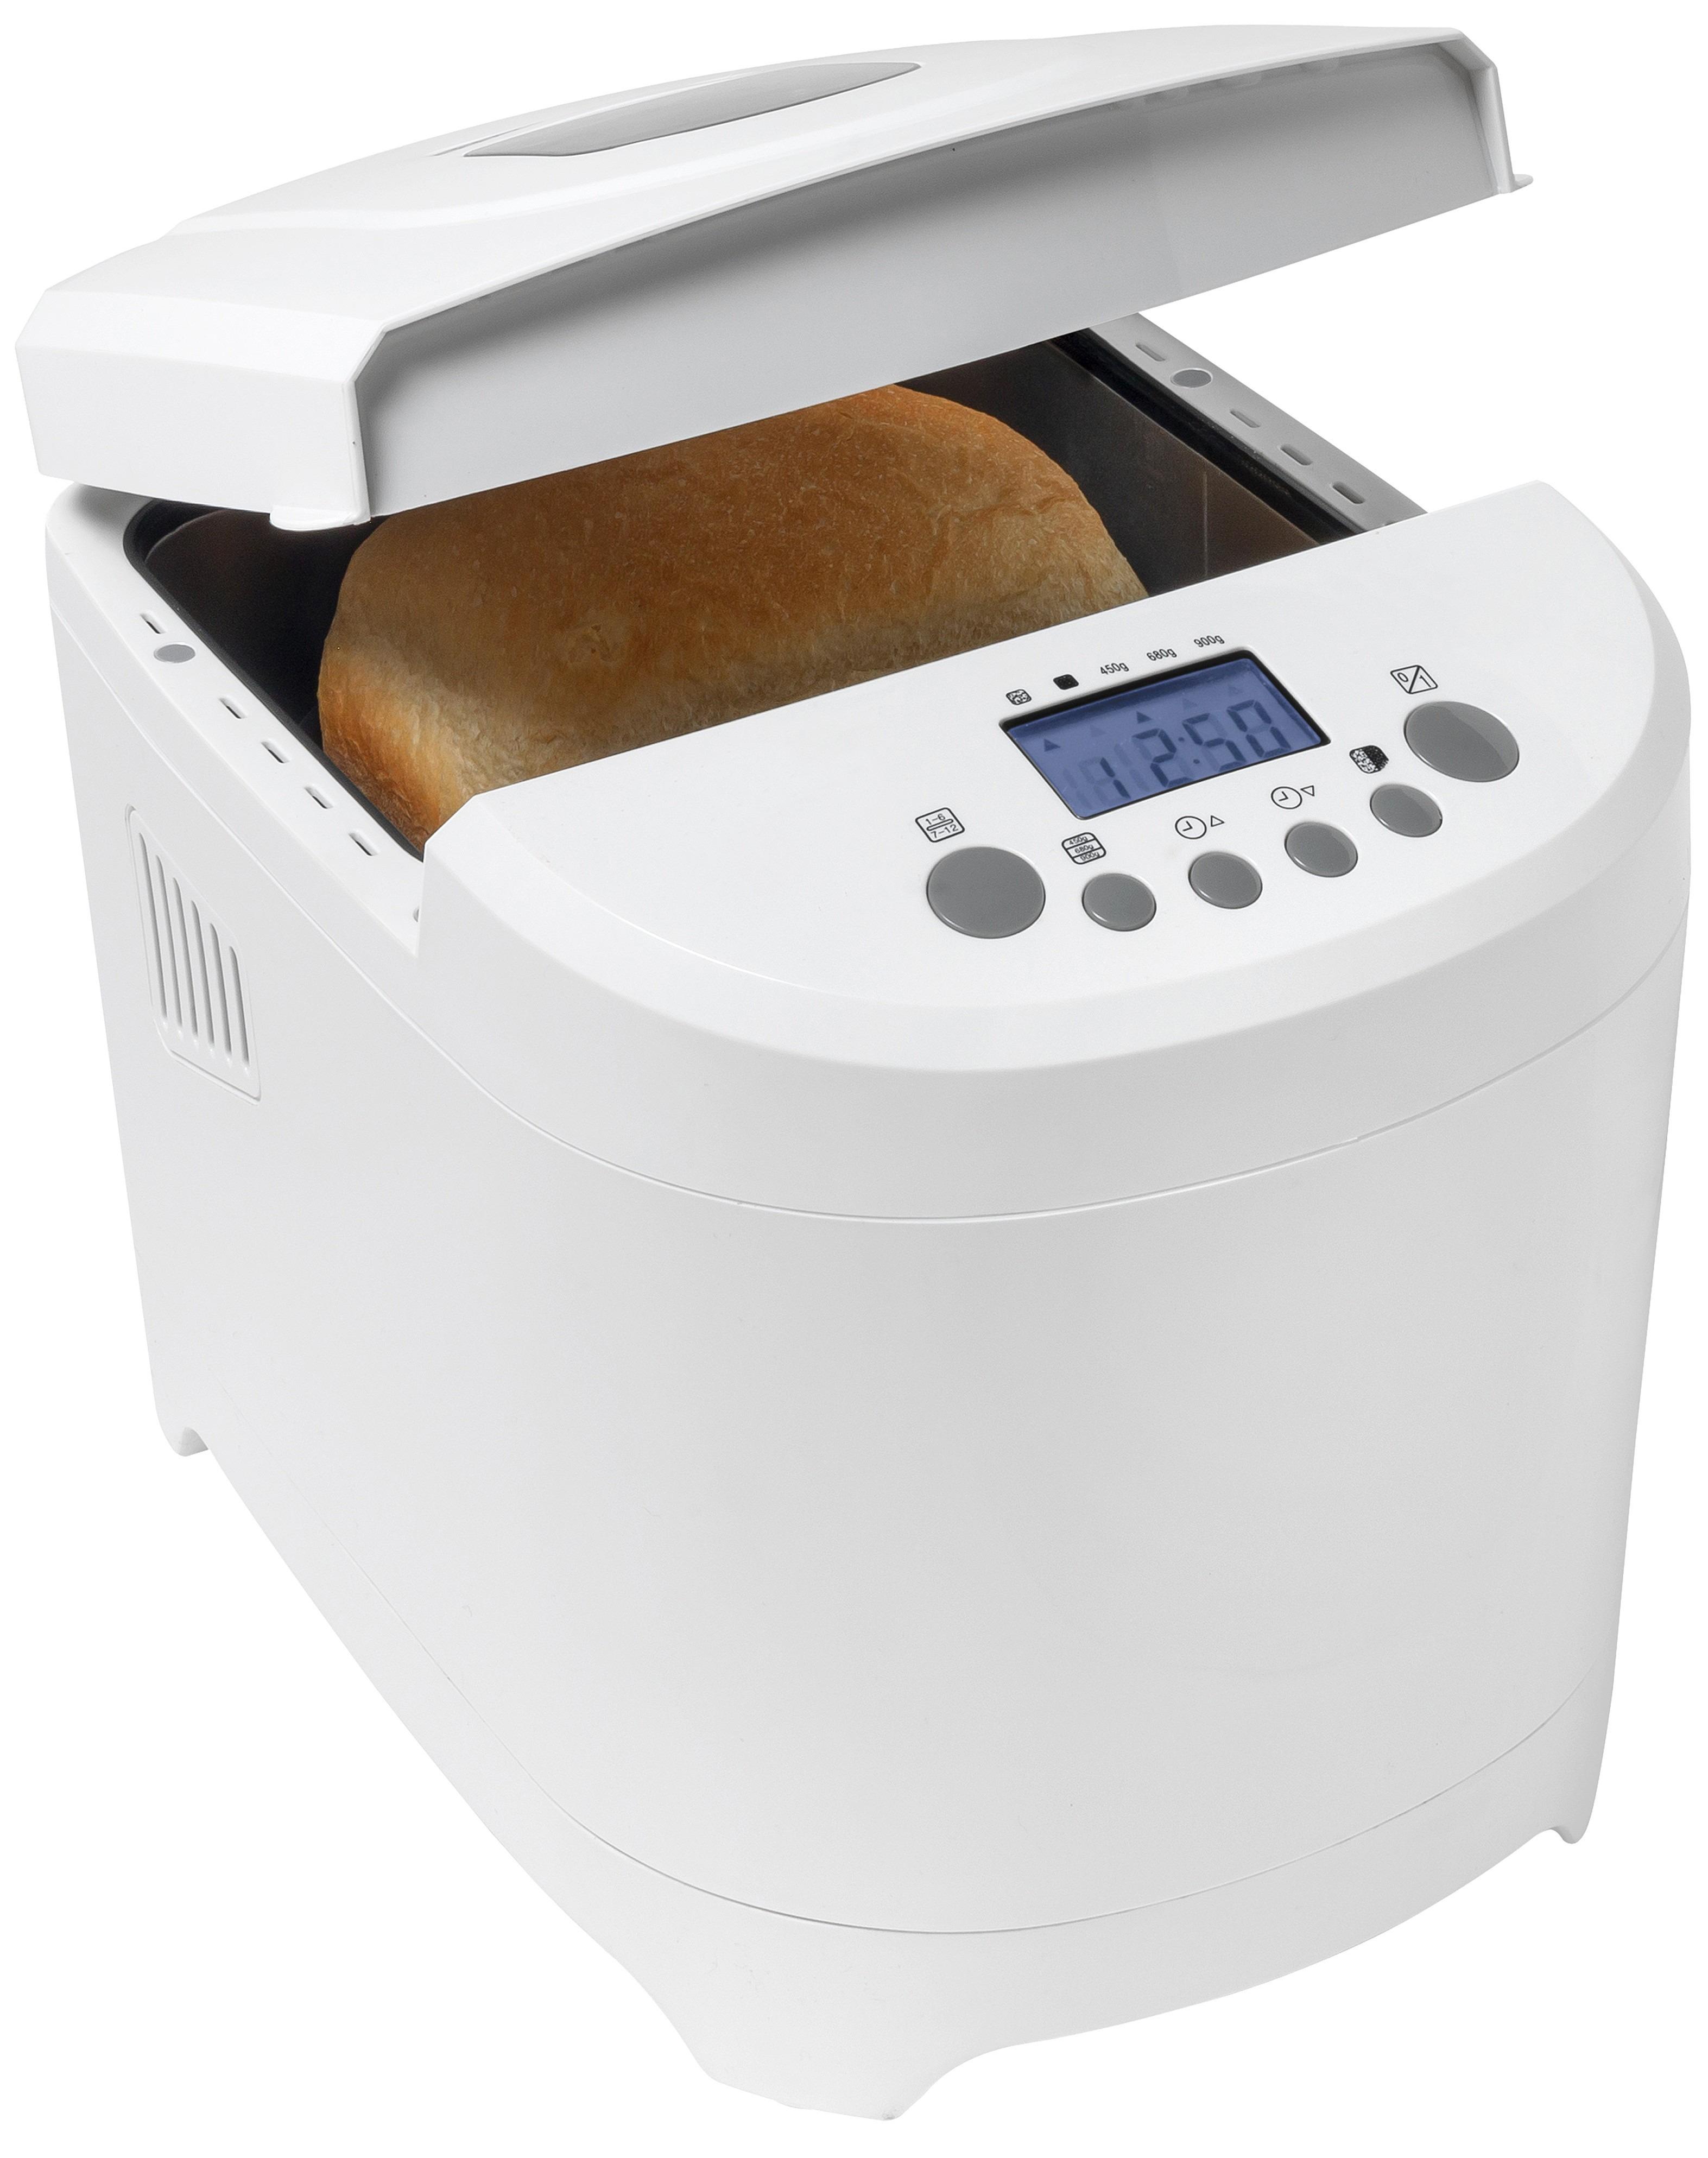 Wonderbaar ▷ Broodbakmachine fif kopen? | Online Internetwinkel OW-34